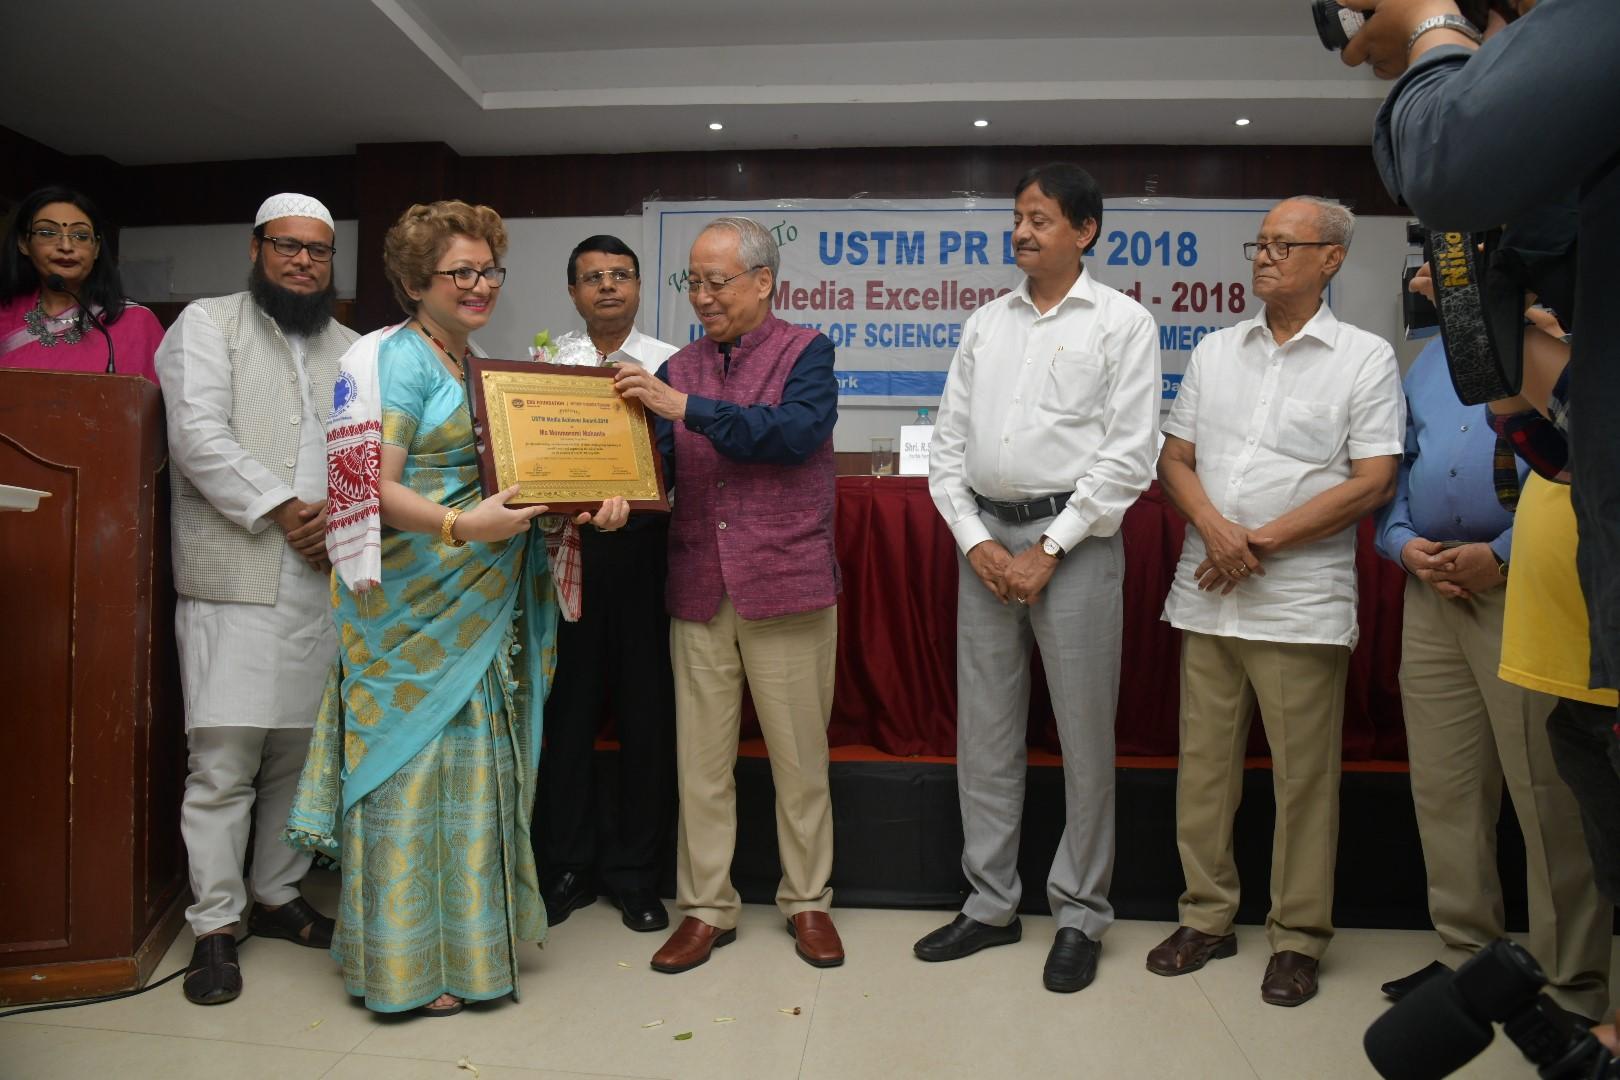 USTM Media Excellence Awards conferred